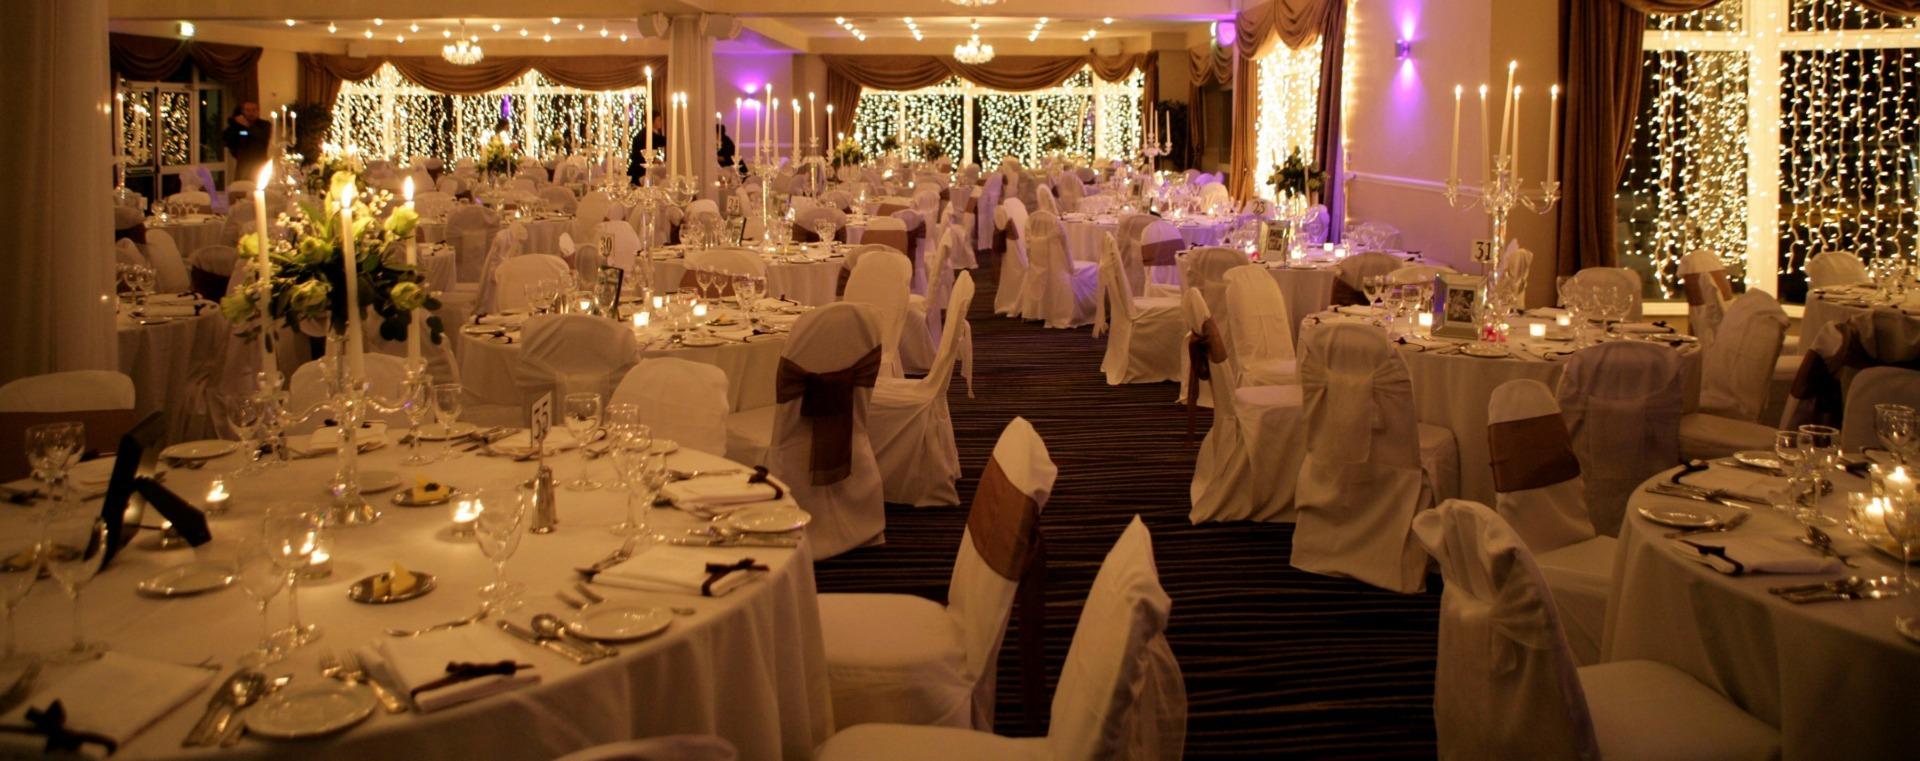 Armada_hotel_fairy_lights